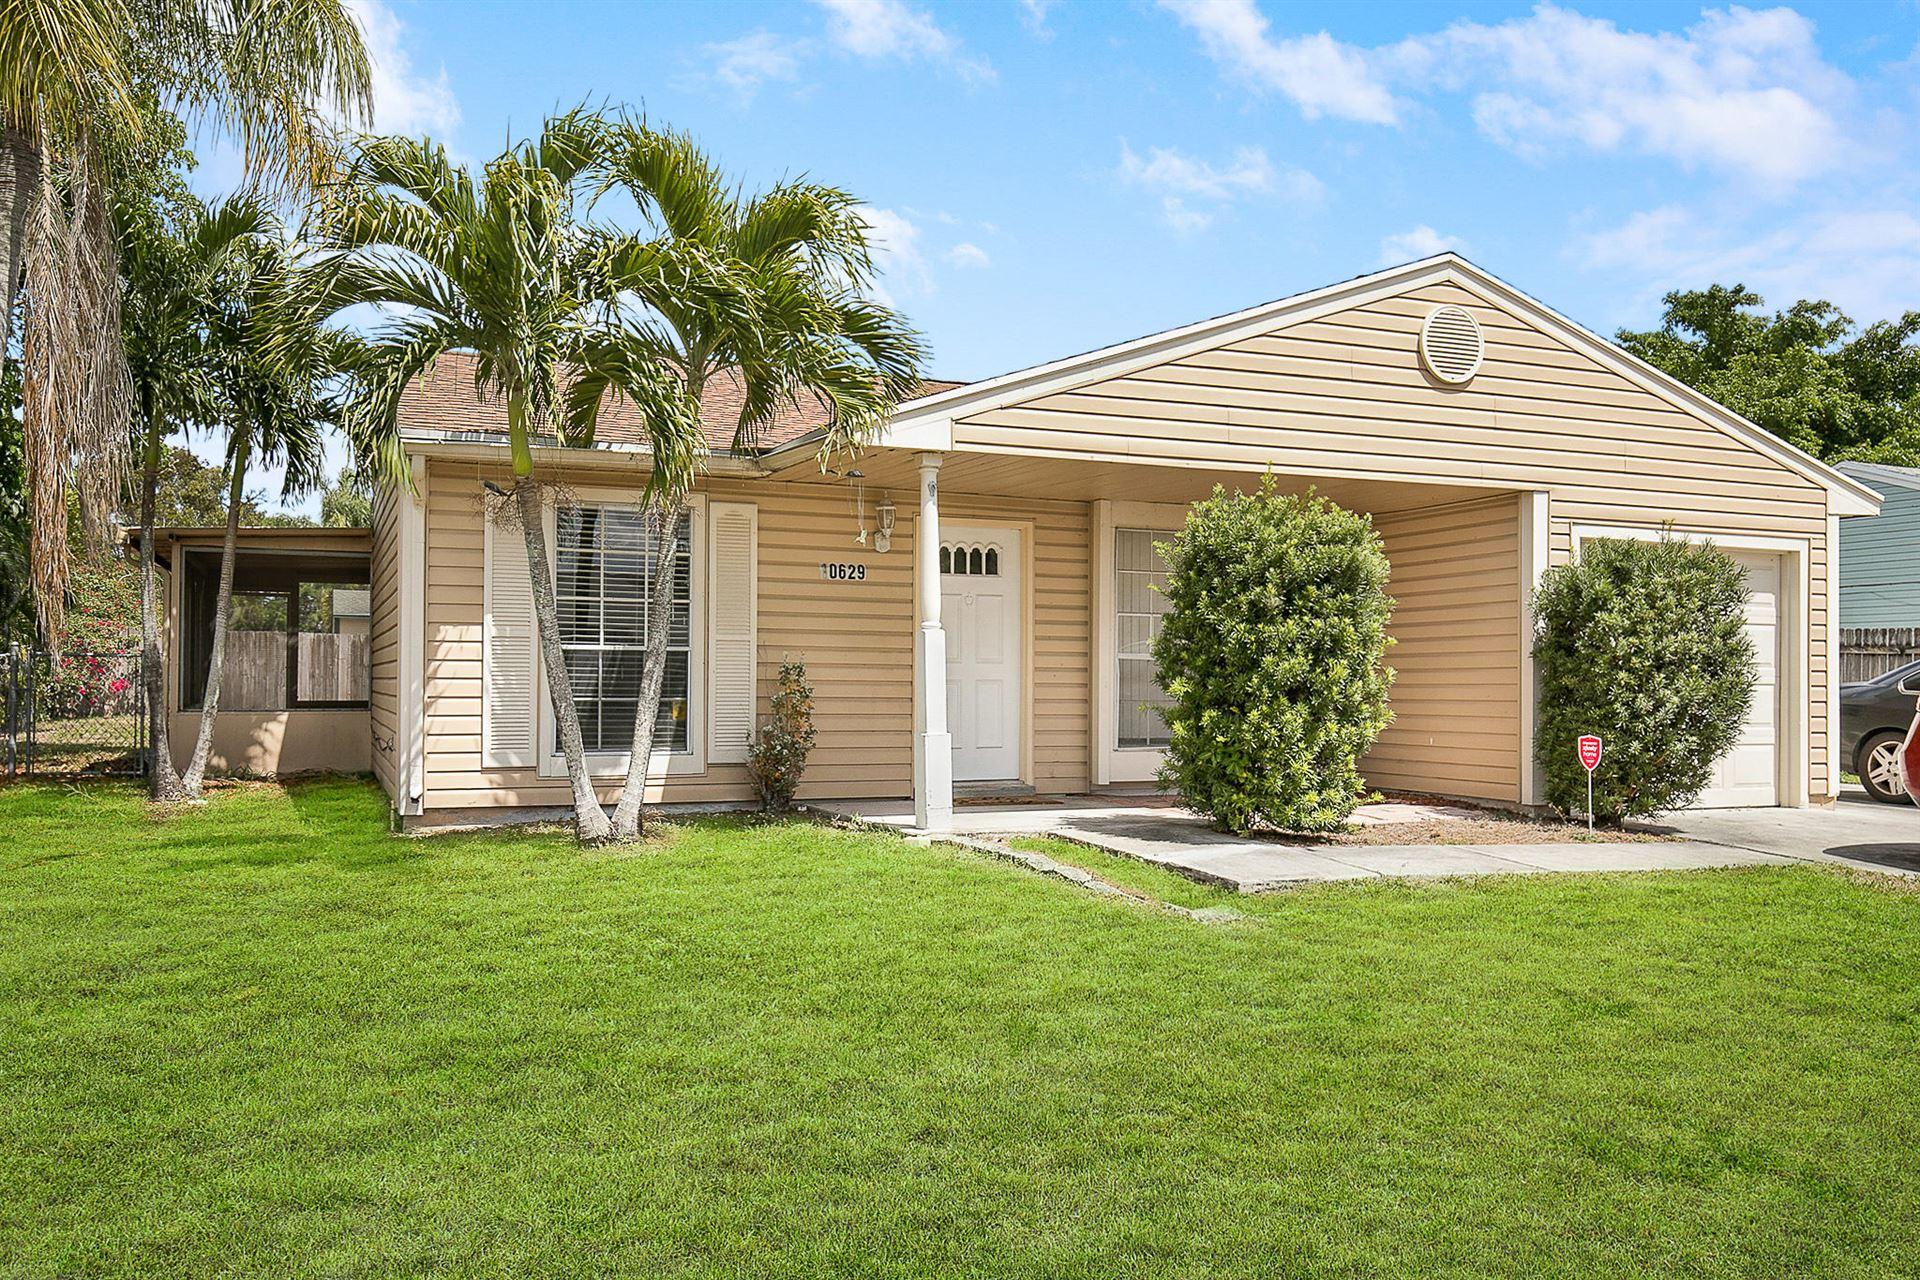 10629 Summertime Lane, Royal Palm Beach, FL 33411 - MLS#: RX-10703449